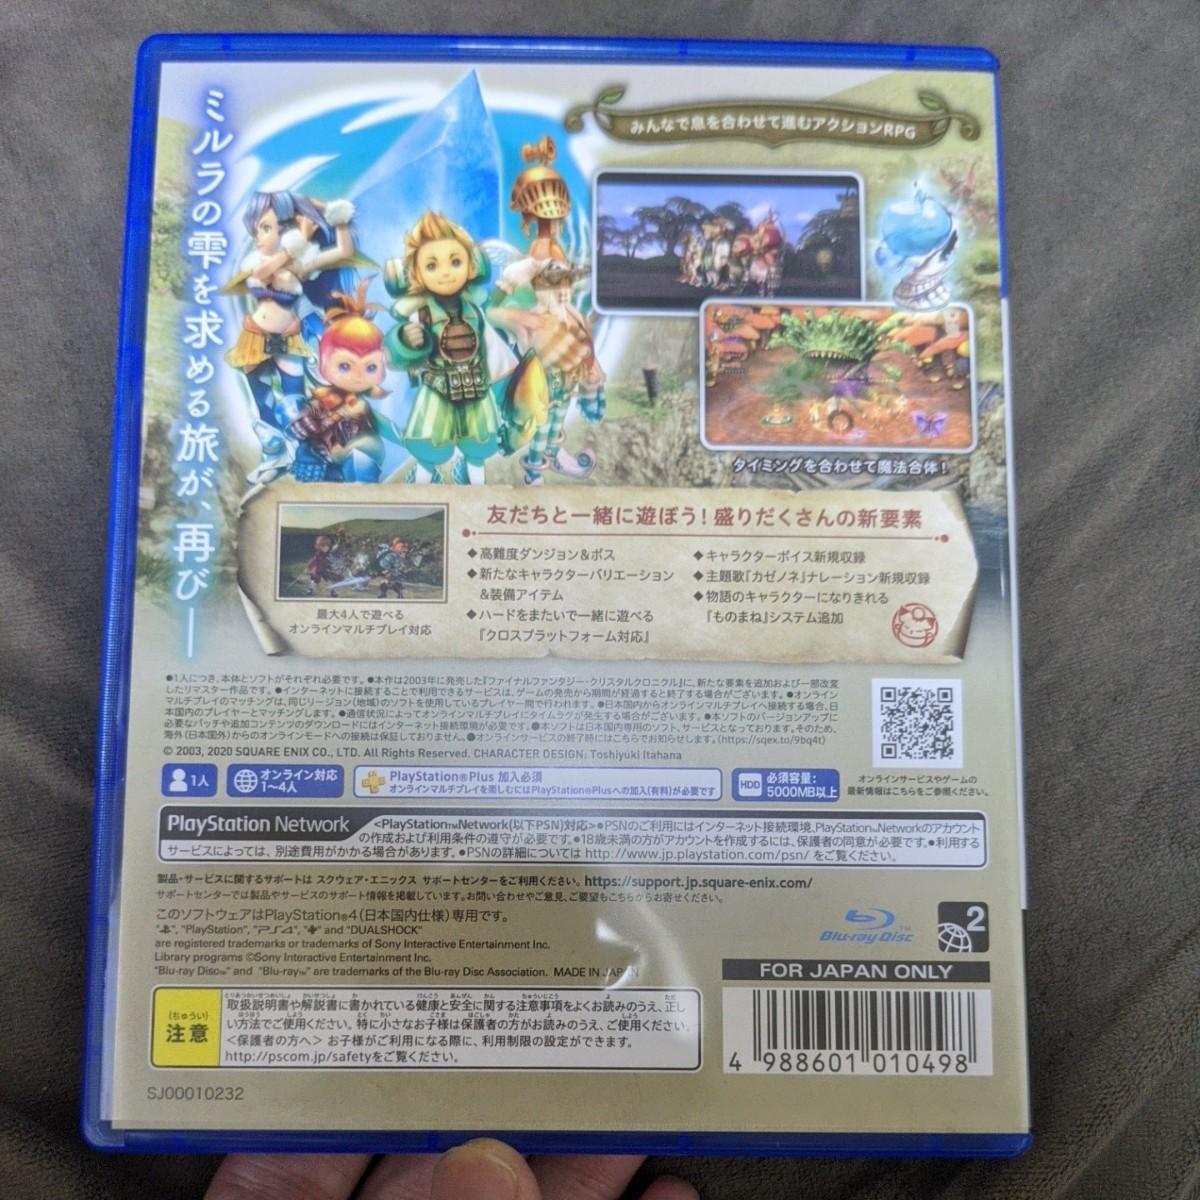 【PS4版】ファイナルファンタジークリスタルクロニクルリマスター版